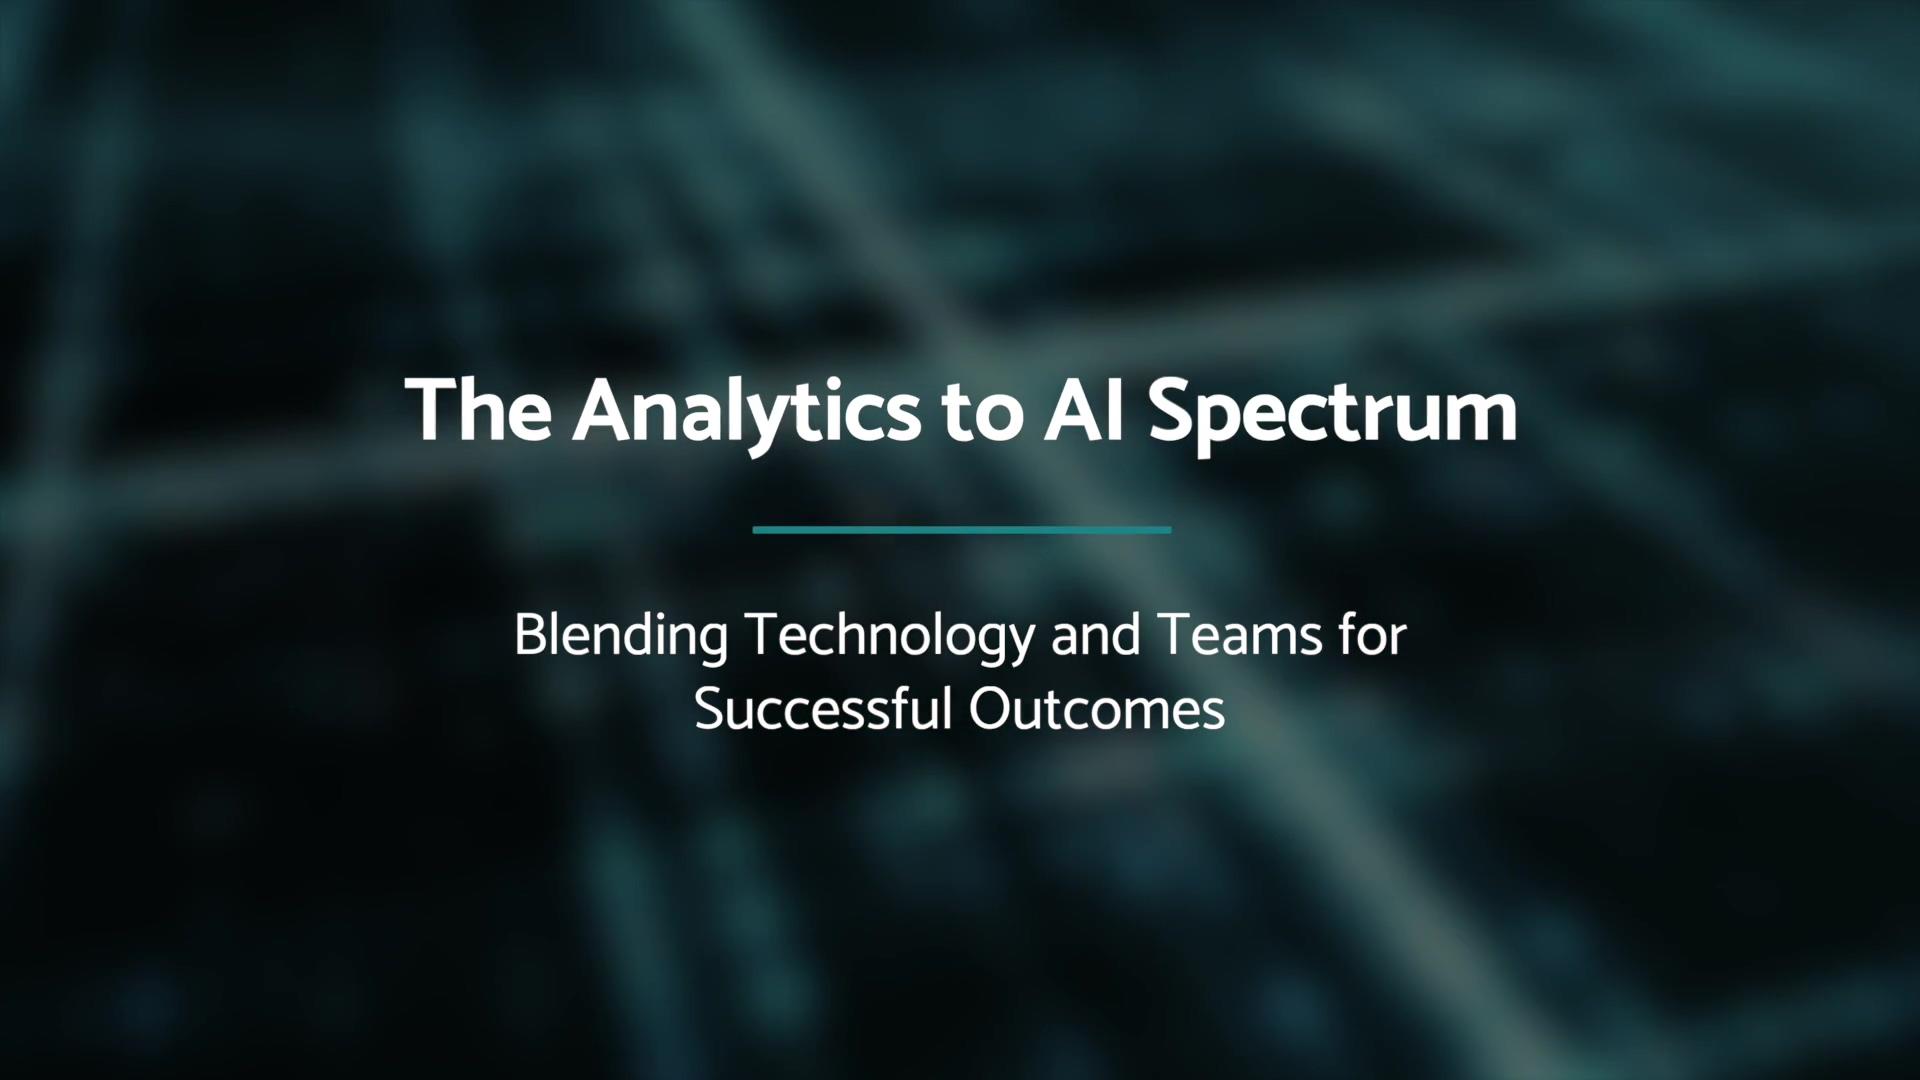 Ventana_Research_VentanaCast_The_Analytics_to_AI_Spectrum_final